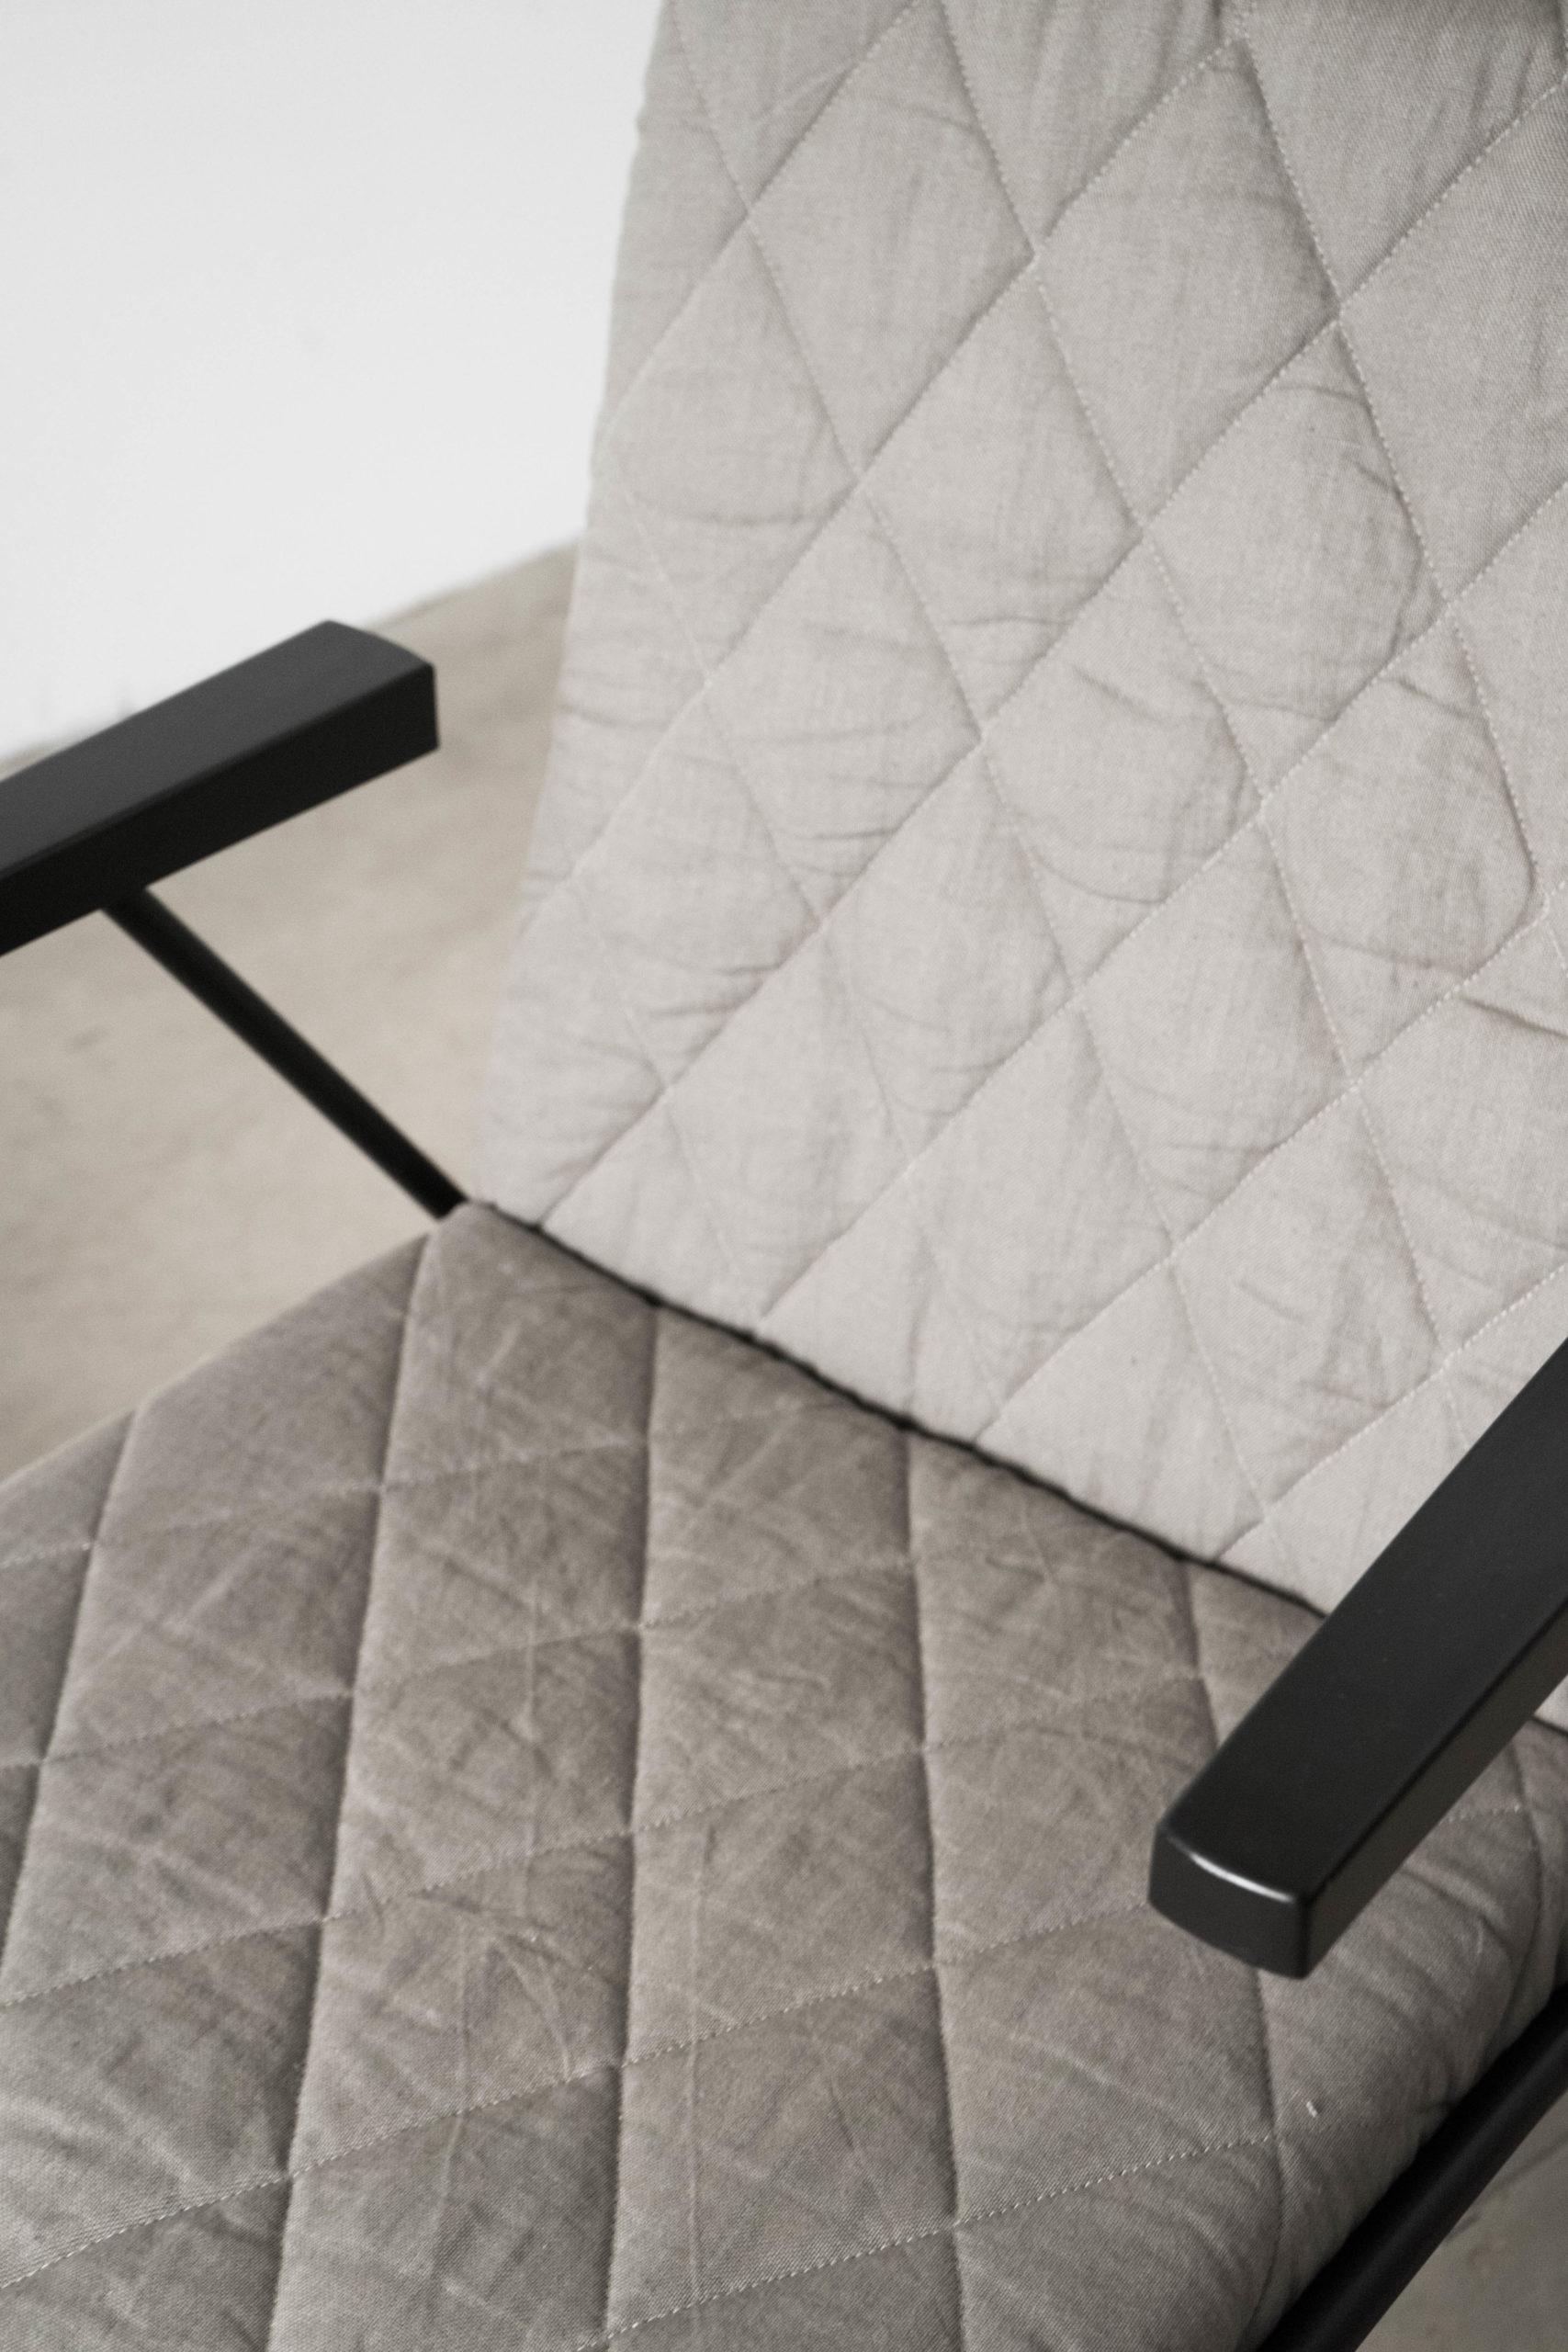 butacas de diseño grises negras de salon de lectura elegantes de calidad fabricadas a mano diseño guata acolchada gris negro